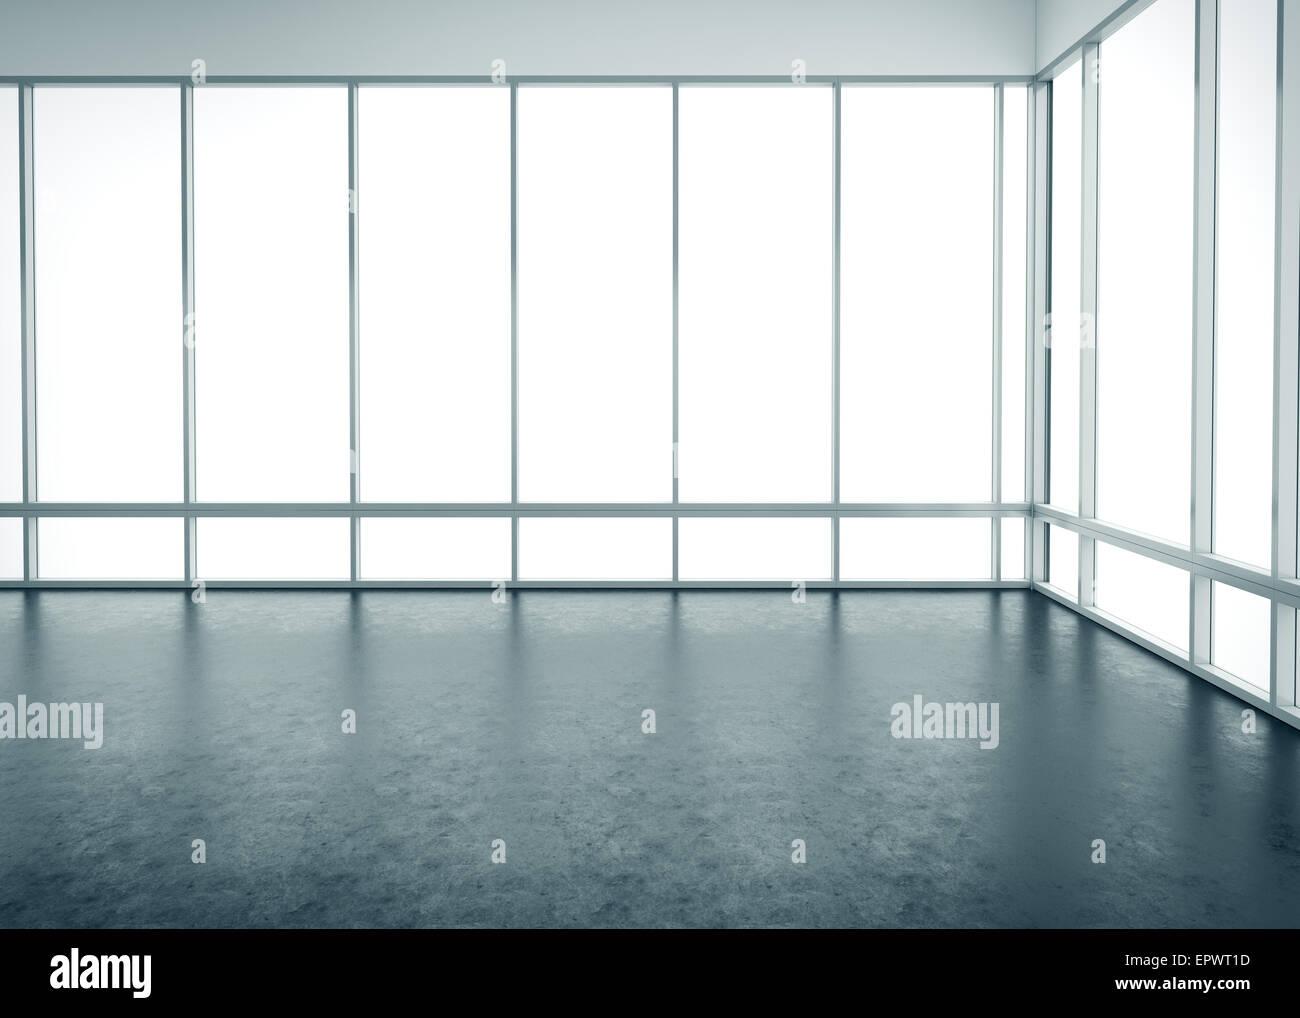 Interior office windows - Stock Photo White Empty Office Interior With Large Windows